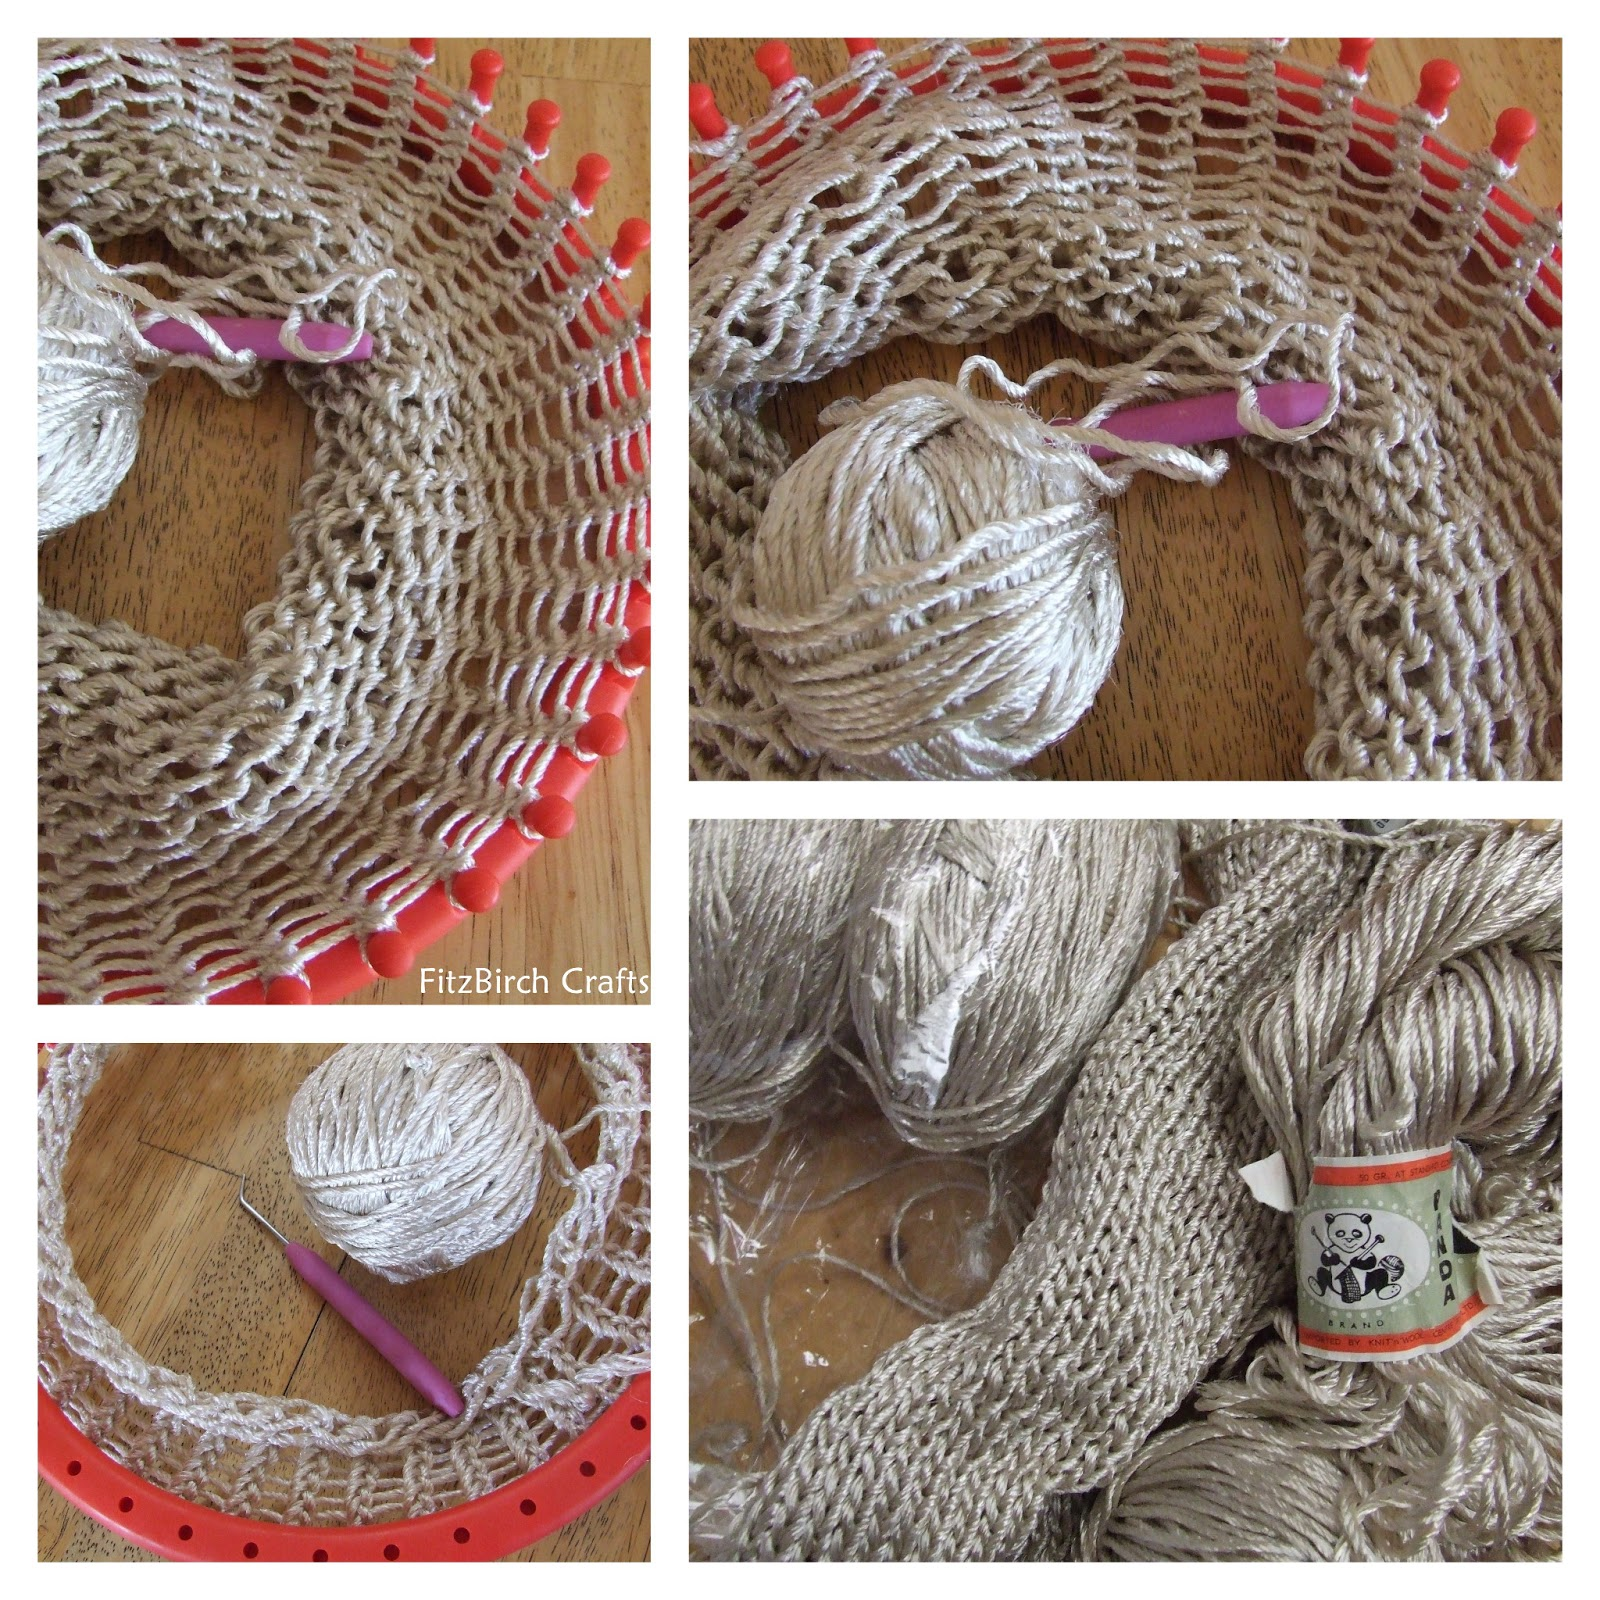 Loom Knitting Bag Patterns : FitzBirch Crafts: Loom Knitting